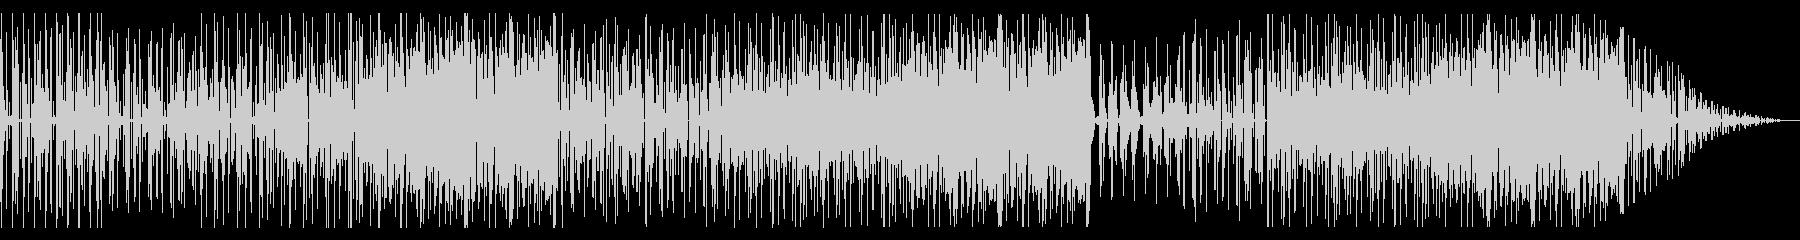 HIPHOPトラック/スクラッチが特徴的の未再生の波形